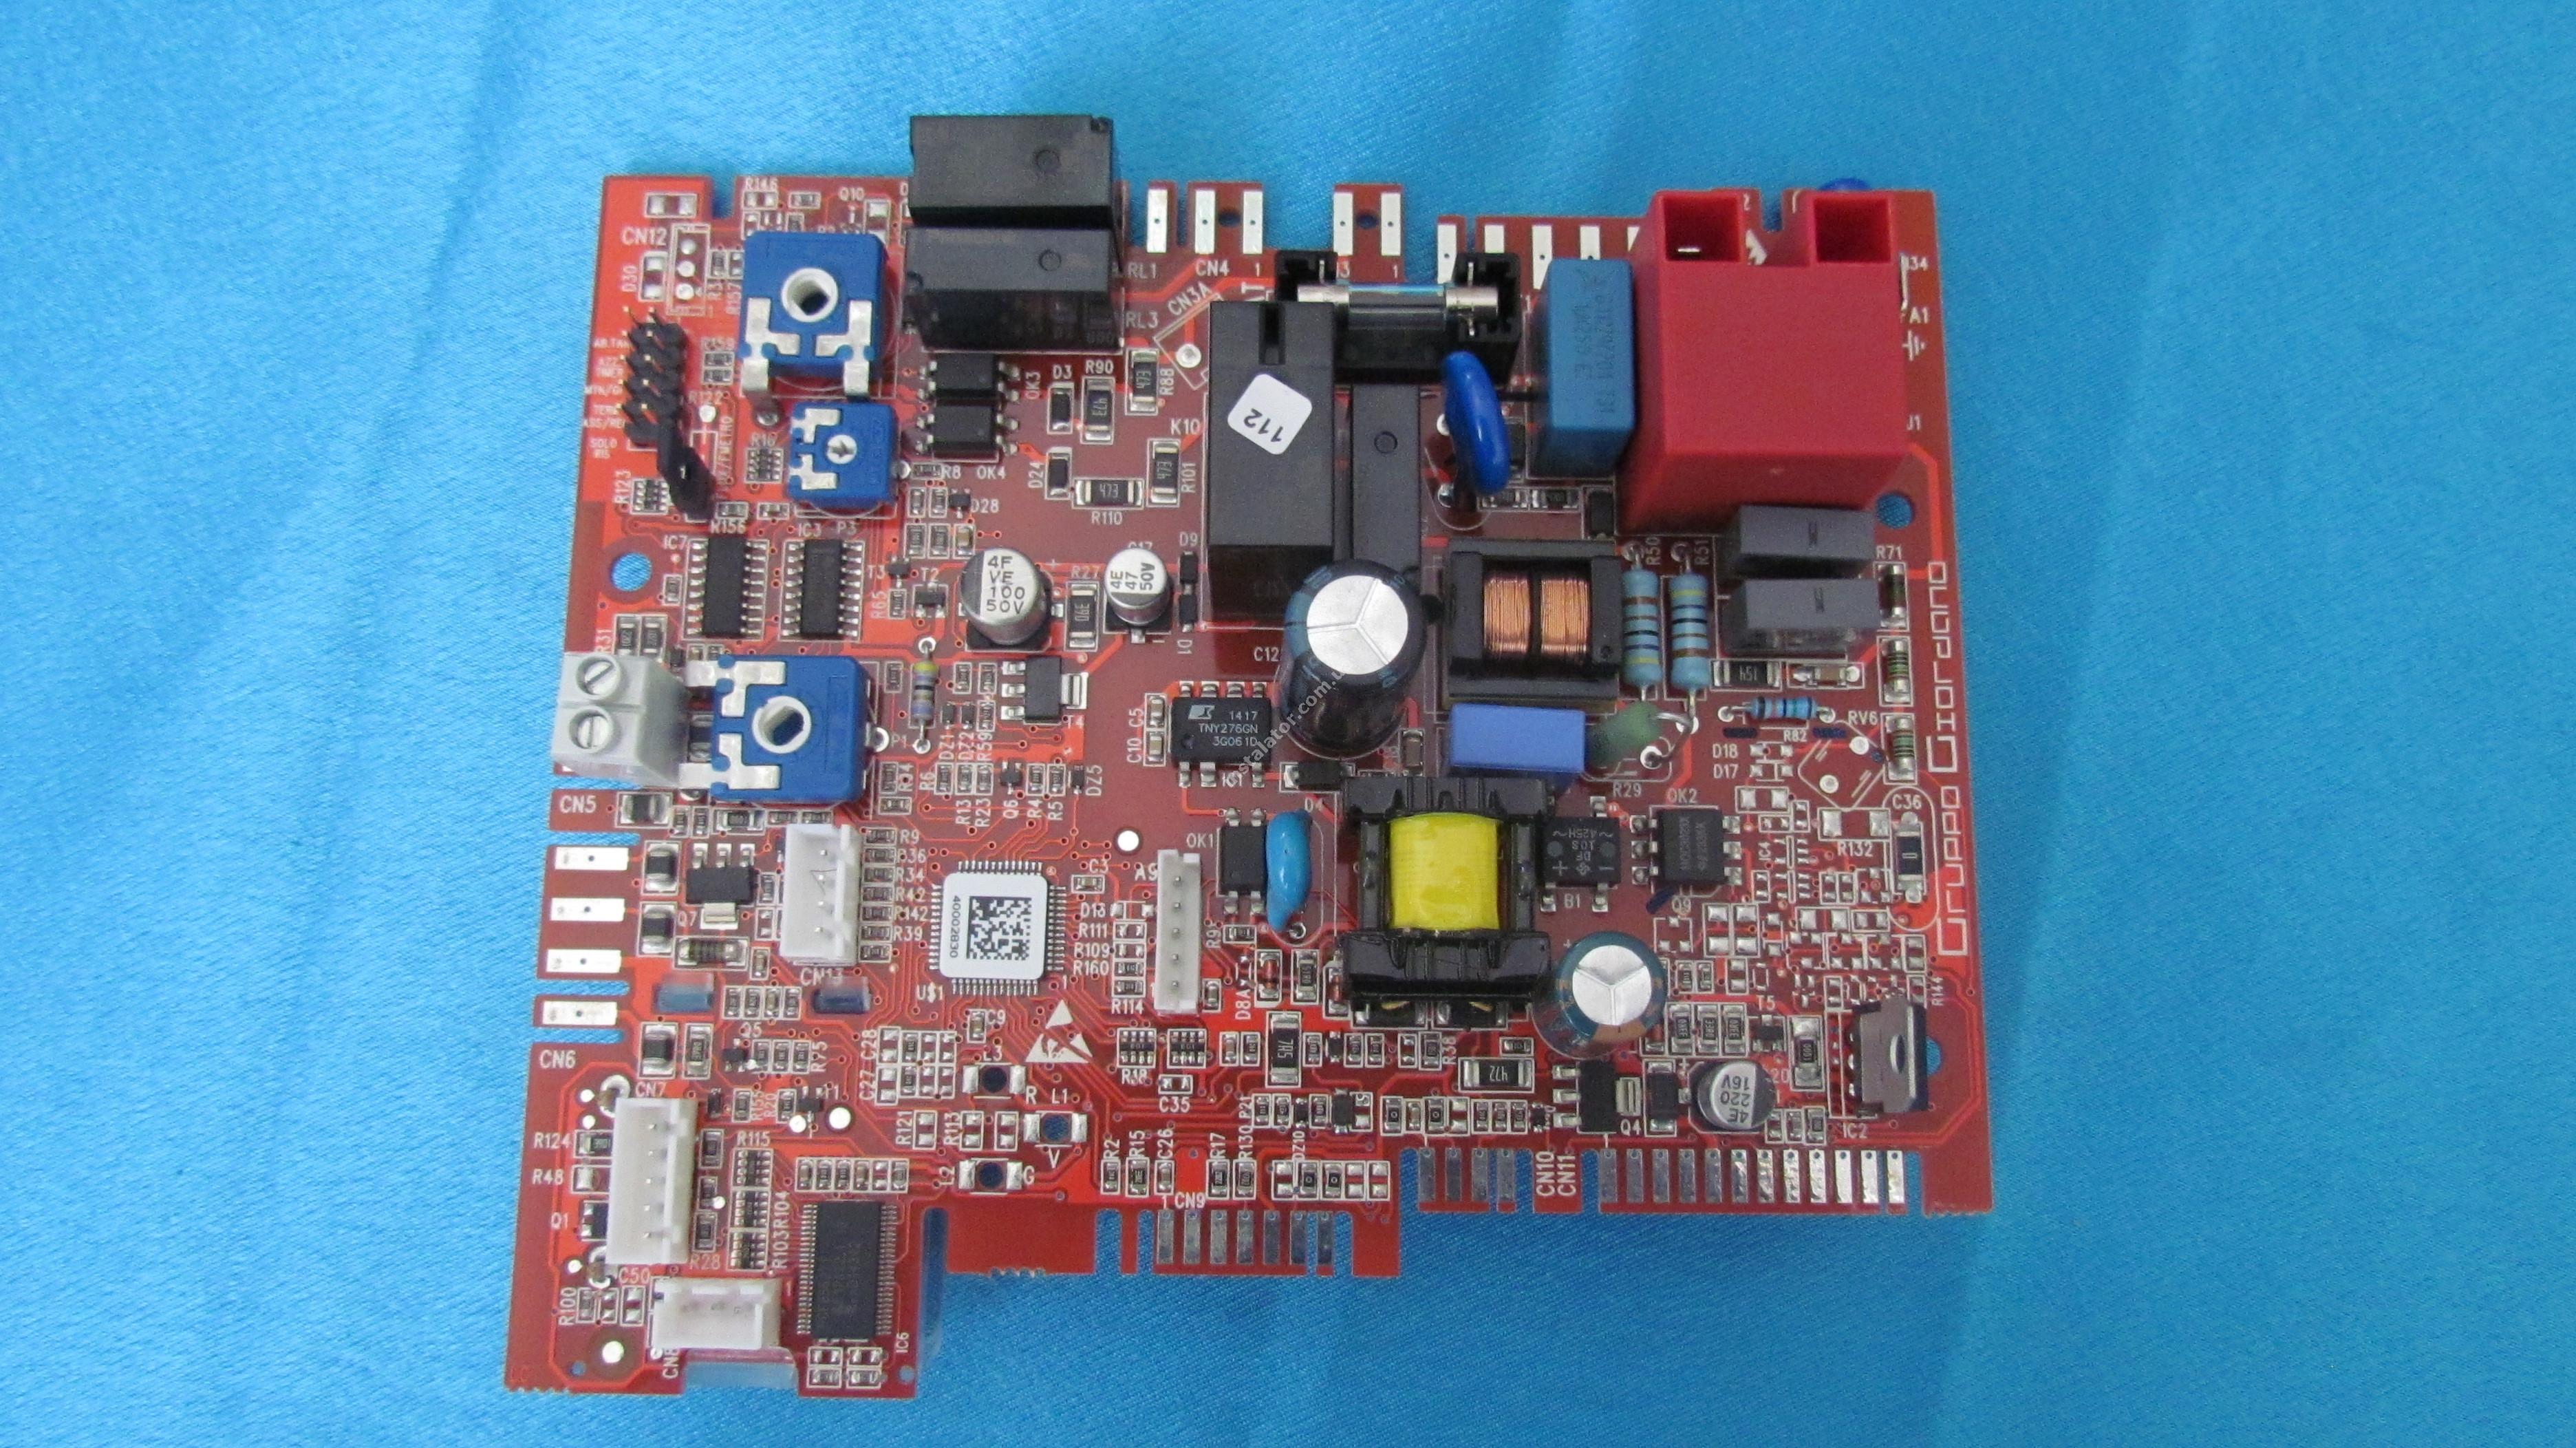 20049611 Плата  керування BERETTA City 24 CSI D( з дисплеєм ) MP05